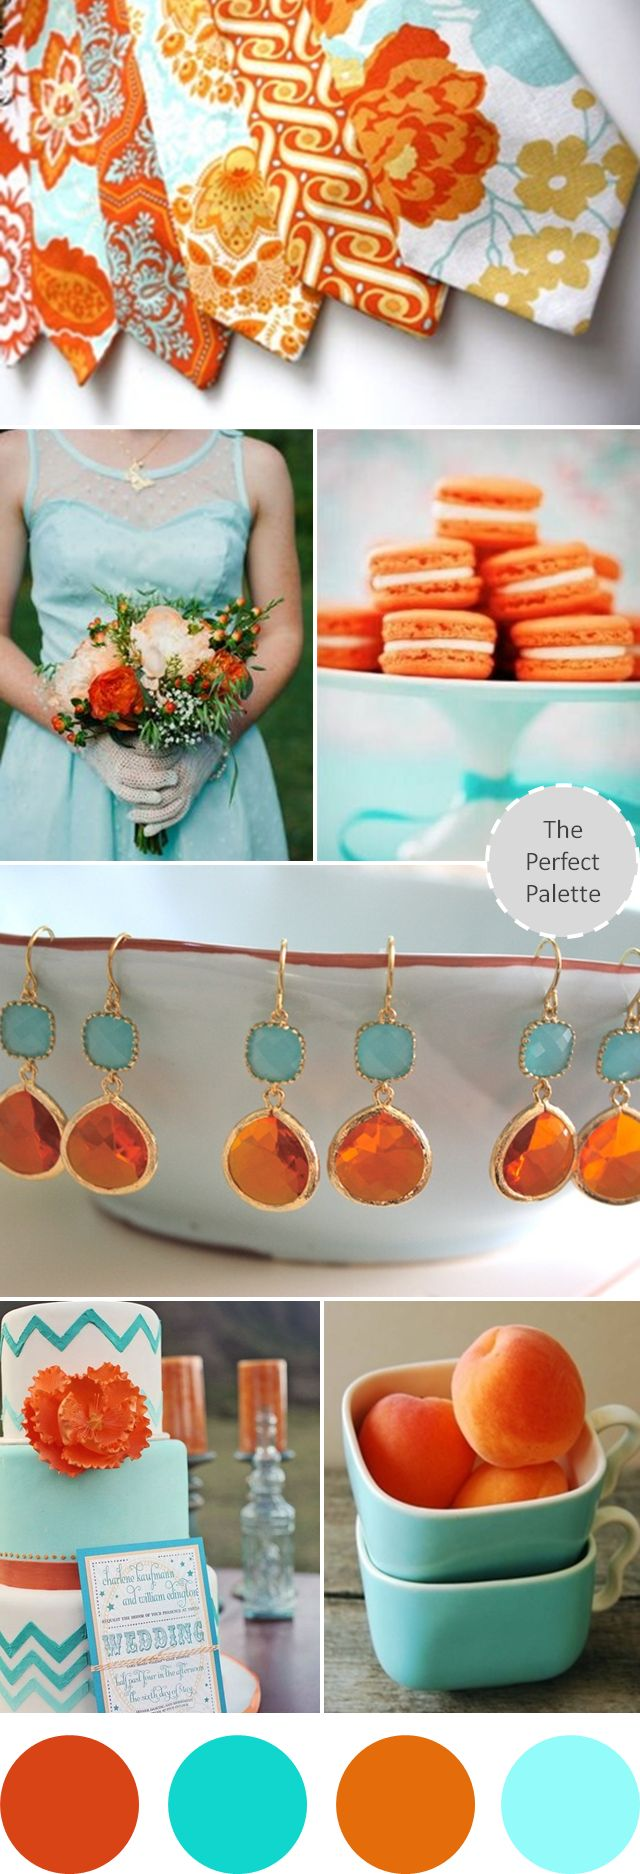 Wedding Colors I Love | Shades of Orange + Aqua! http://www.theperfectpalette.com/2013/08/wedding-colors-i-love-shades-of-orange.html